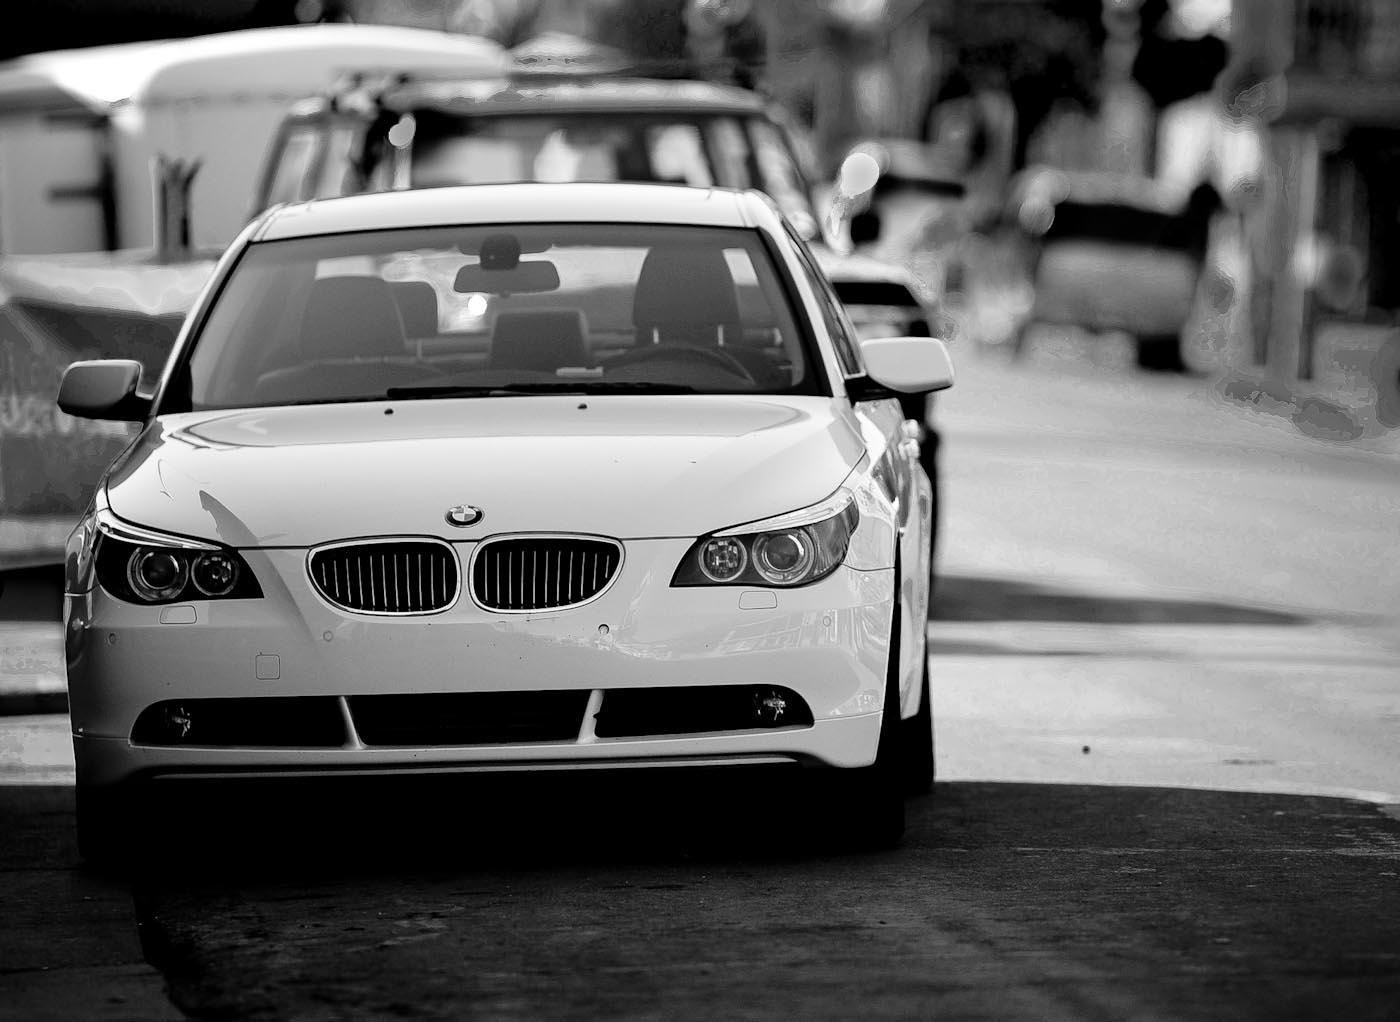 BMW 5-series Service